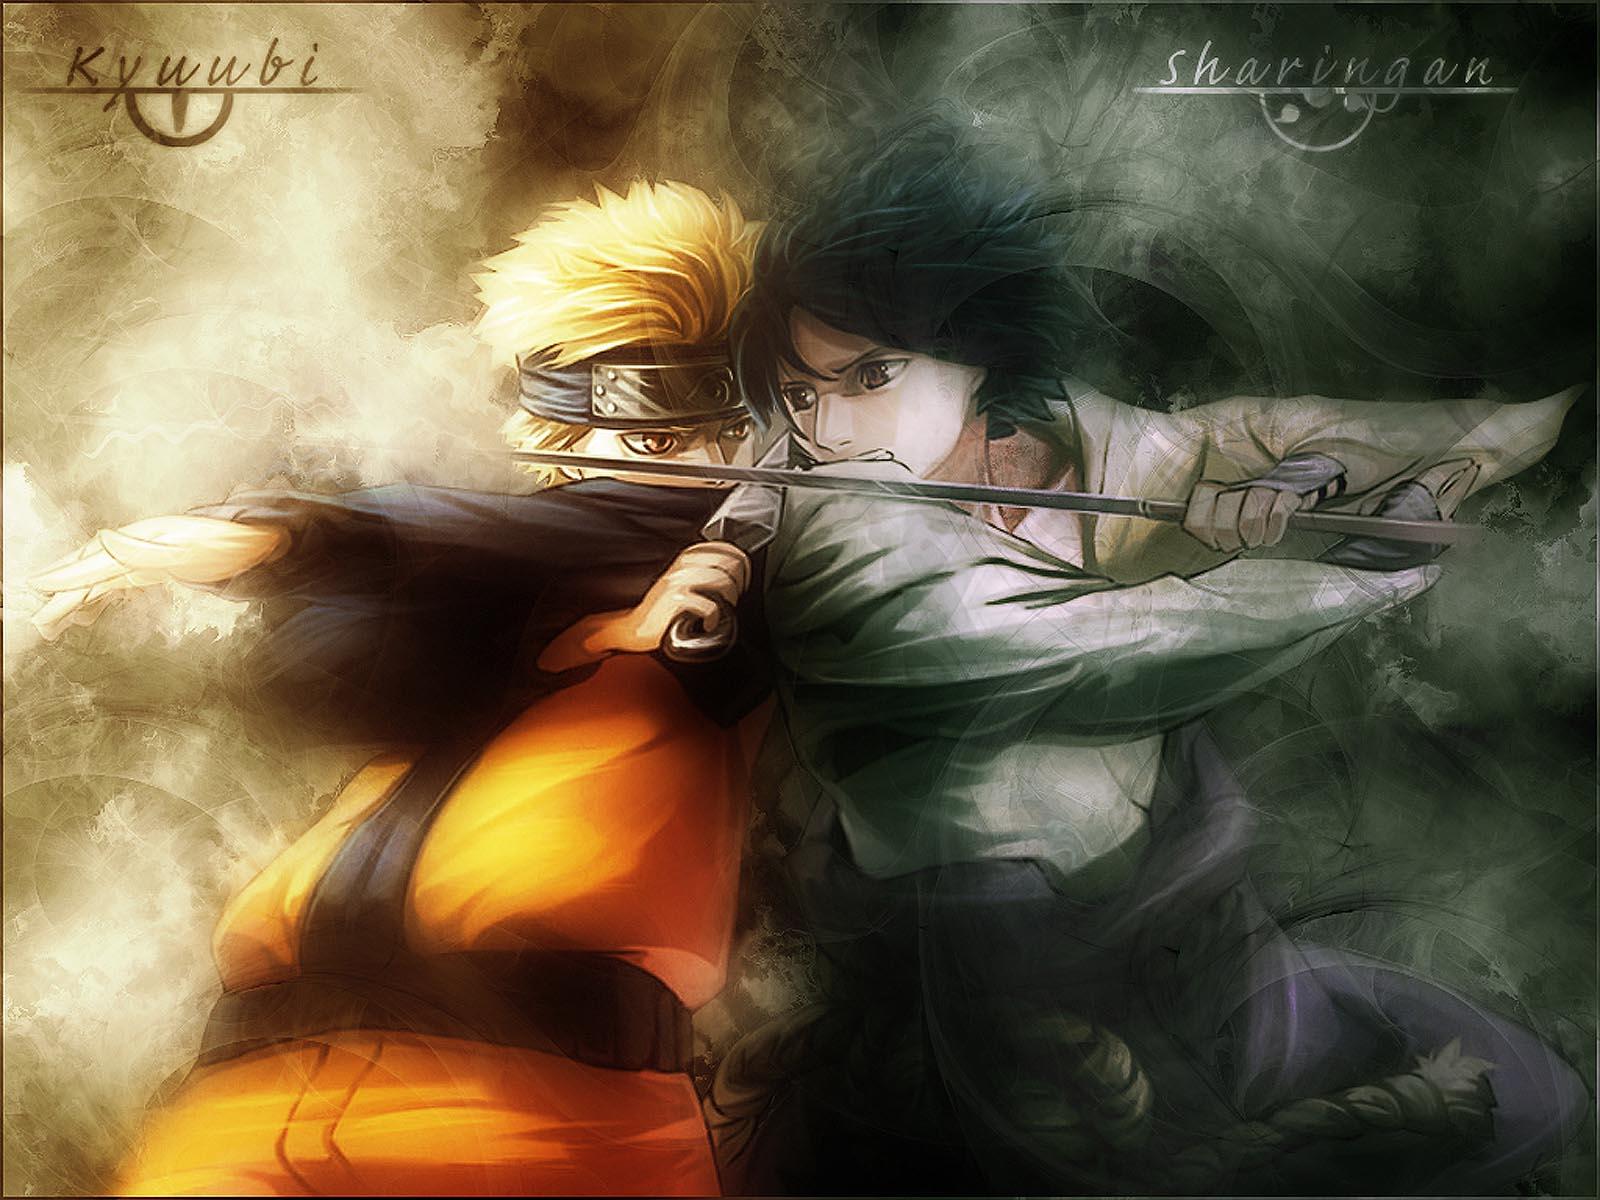 Naruto Shippuden Wallpaper 1256 Hd Wallpapers in Cartoons   Imagesci 1600x1200